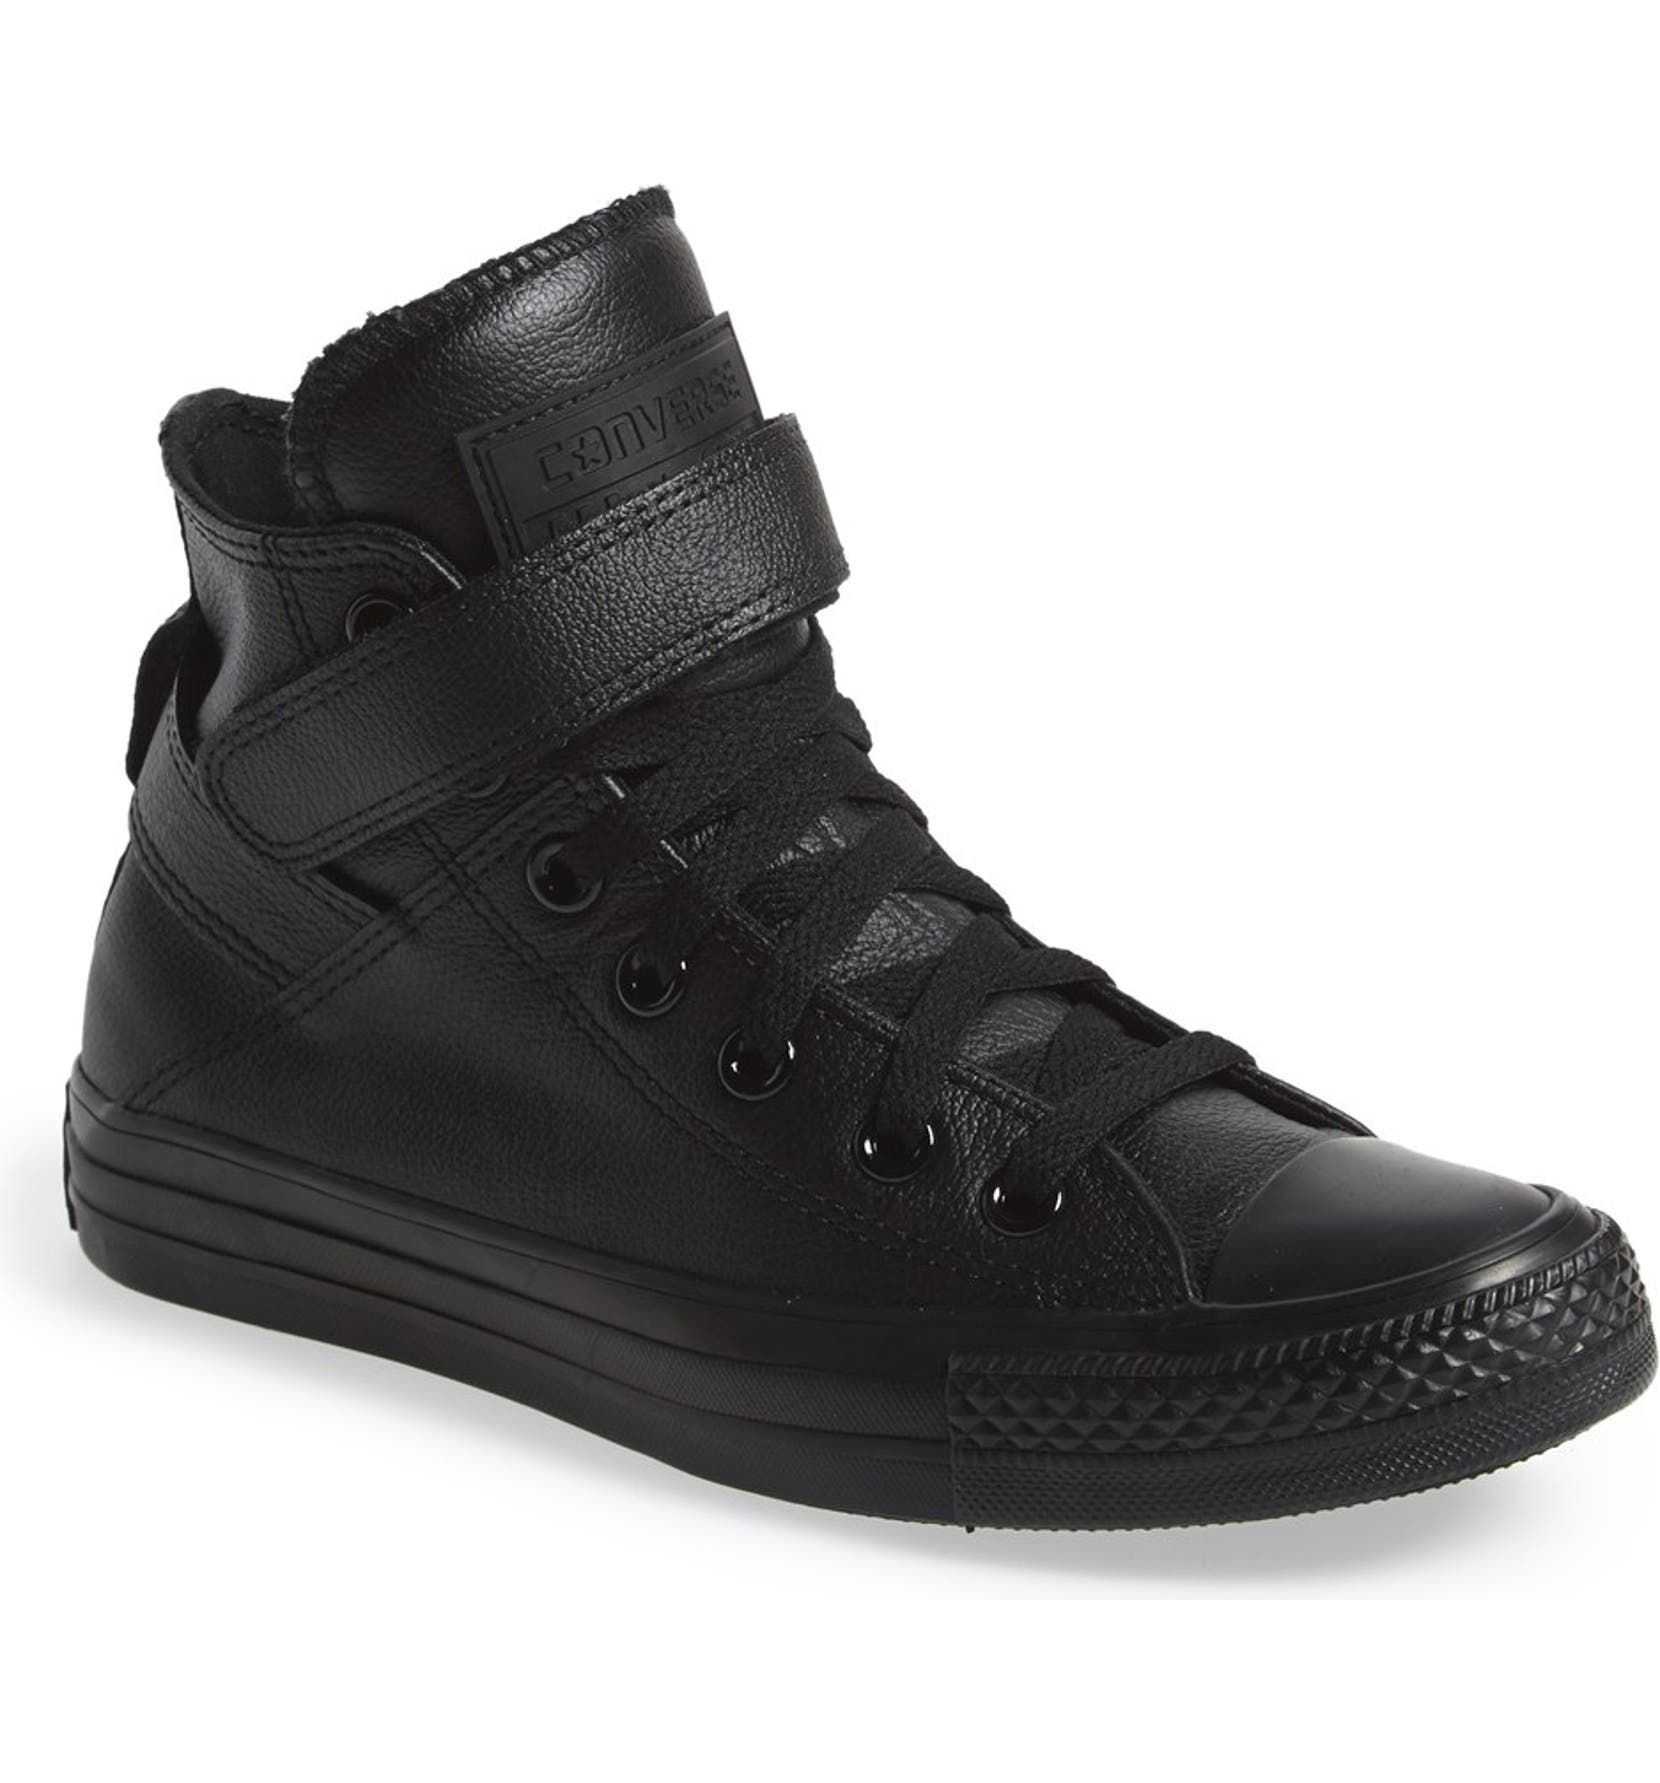 0d670307f051 Converse Chuck Taylor® All Star®  Brea  Leather High Top Sneaker (Women)